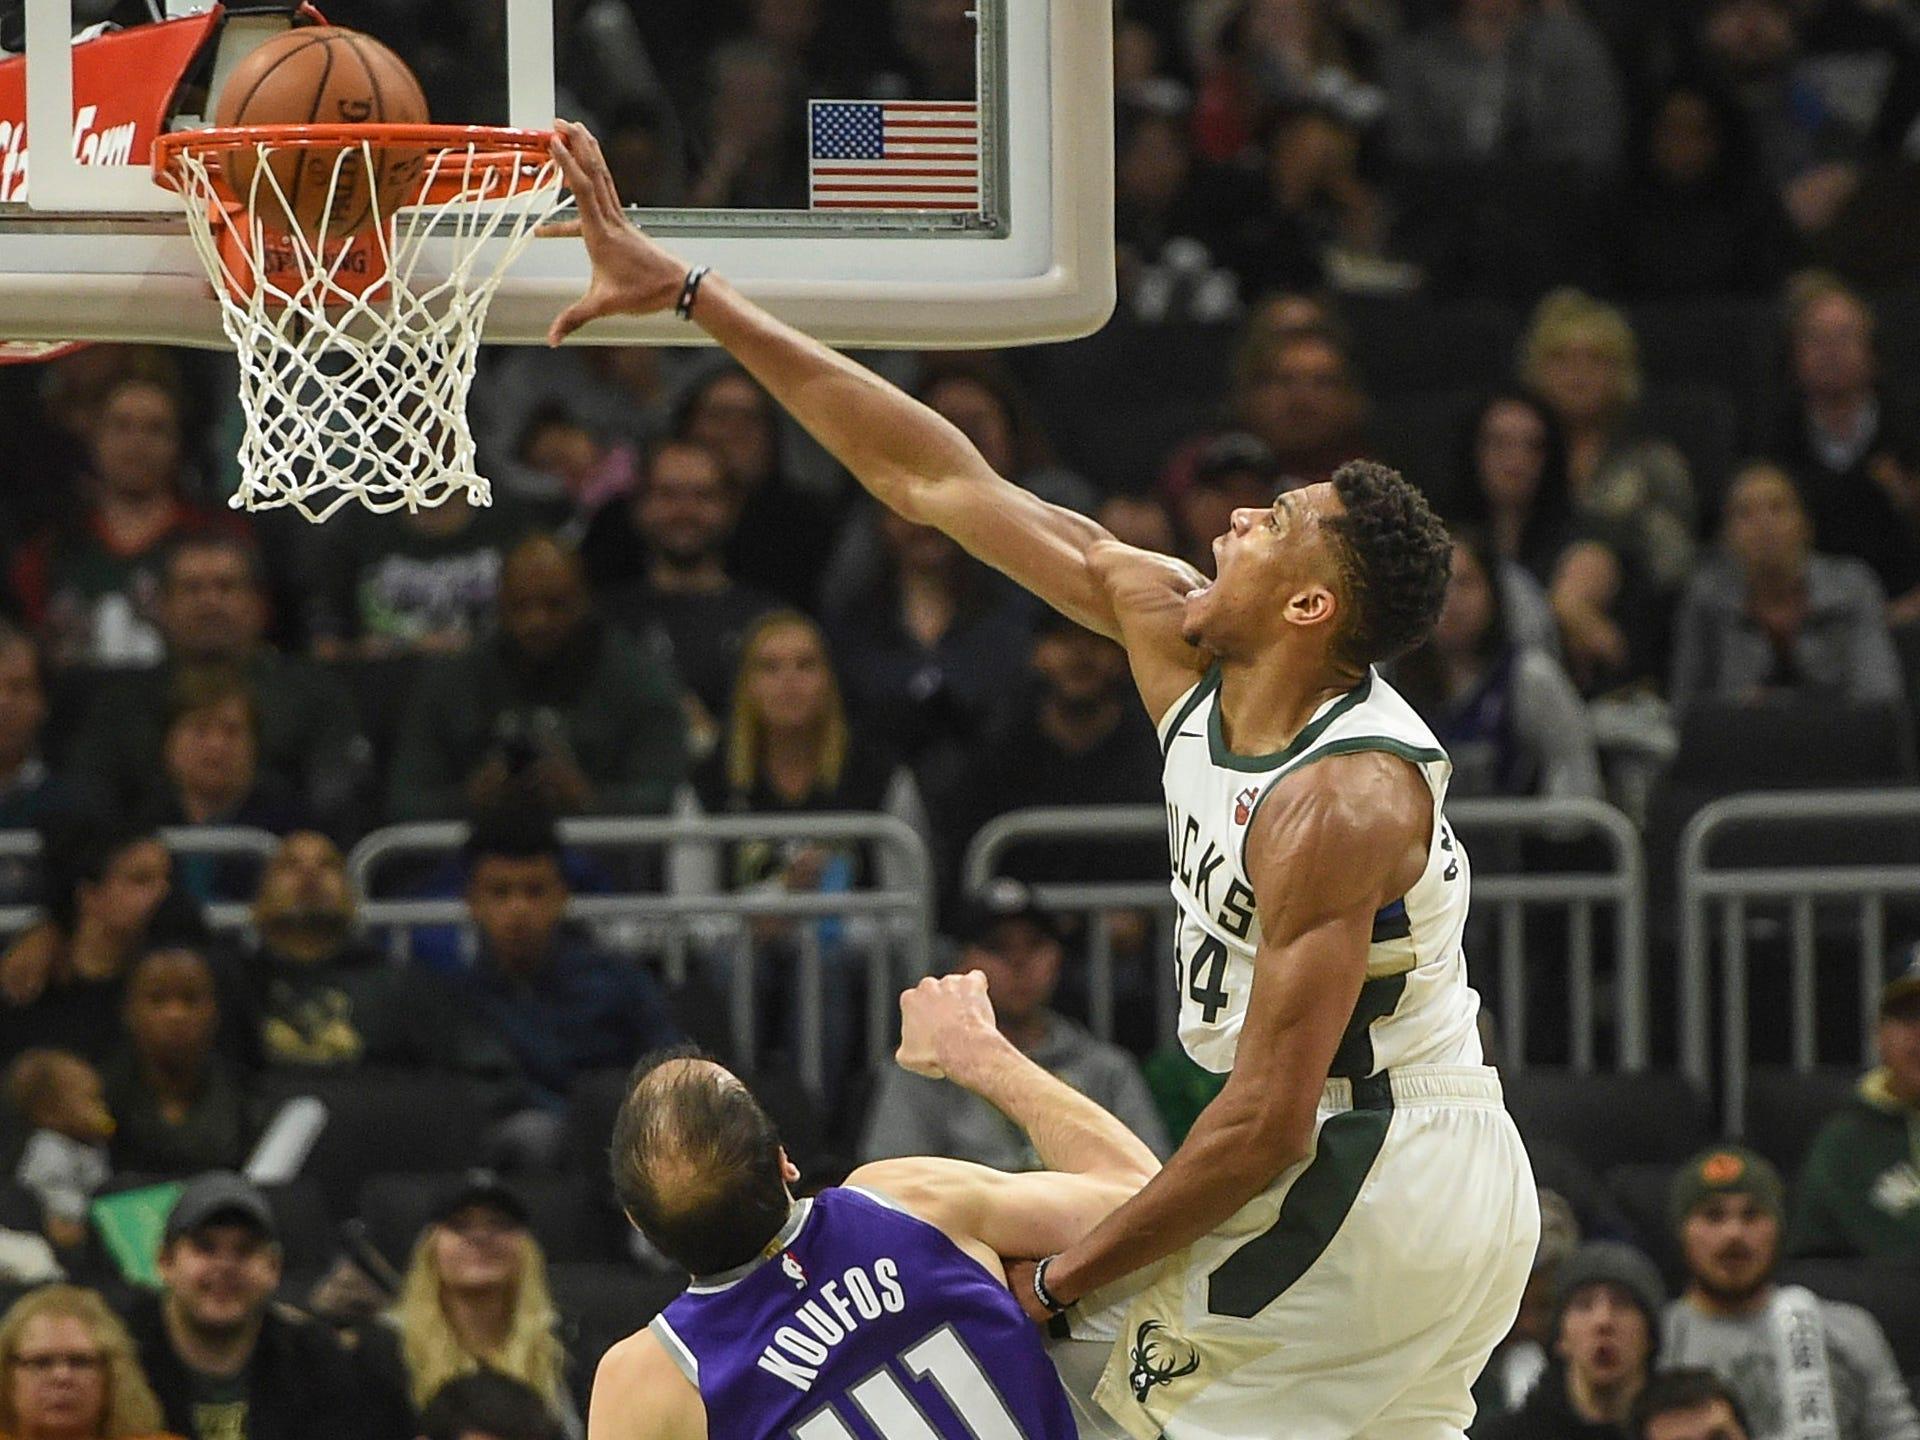 Nov. 4: Bucks forward Giannis Antetokounmpo (34) throws down a ferocious one-handed slam over Kings defender Kosta Koufos (41) during the second half in Milwaukee.